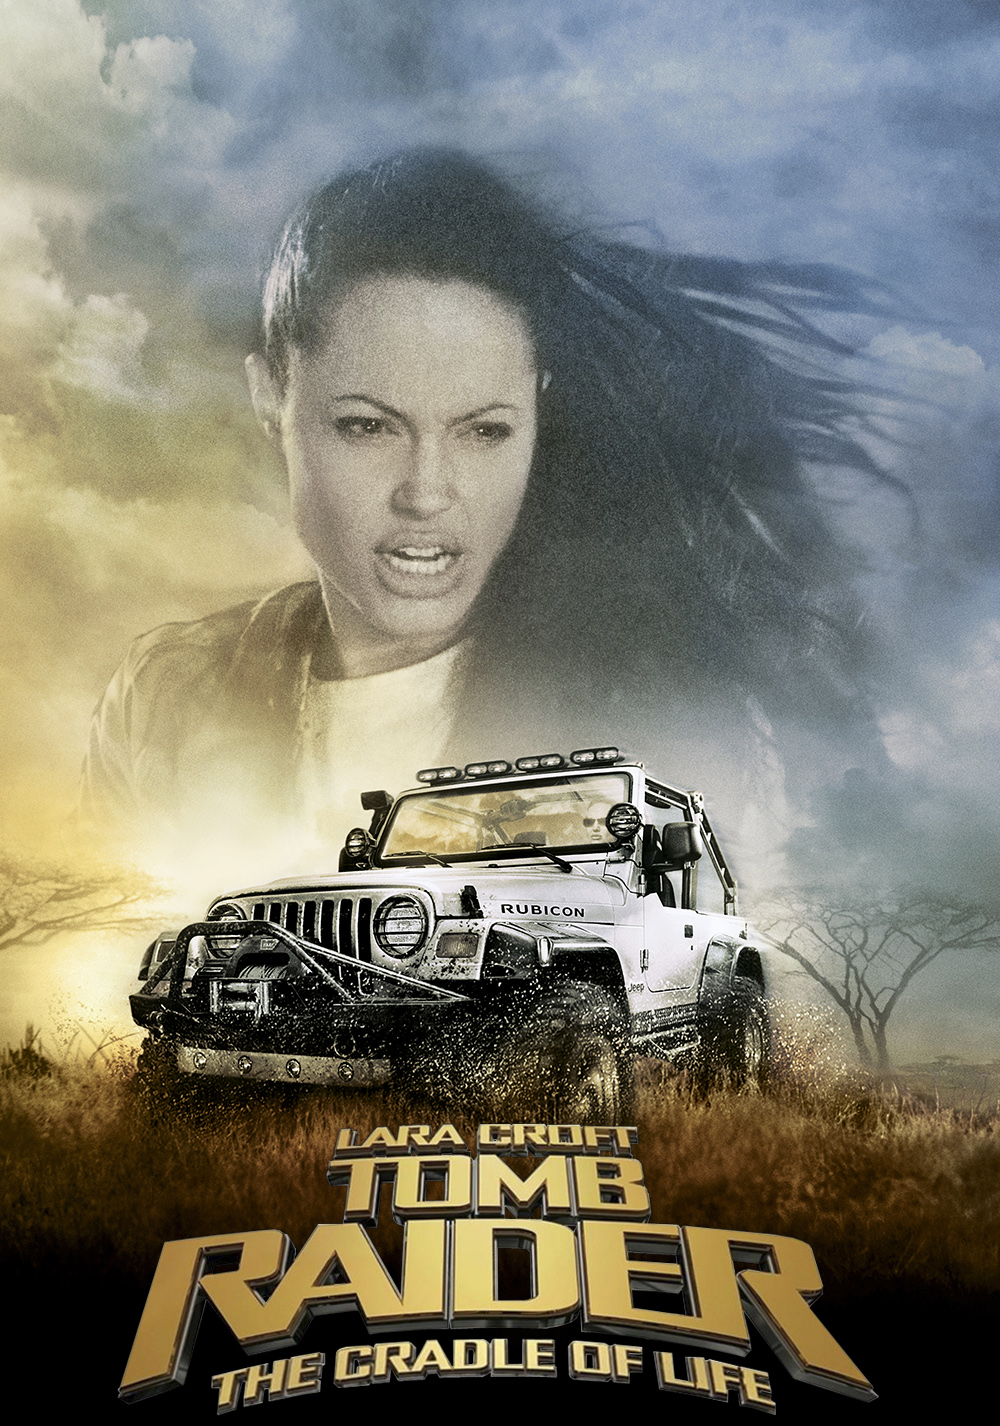 Lara Croft Tomb Raider The Cradle Of Life Movie Poster Id